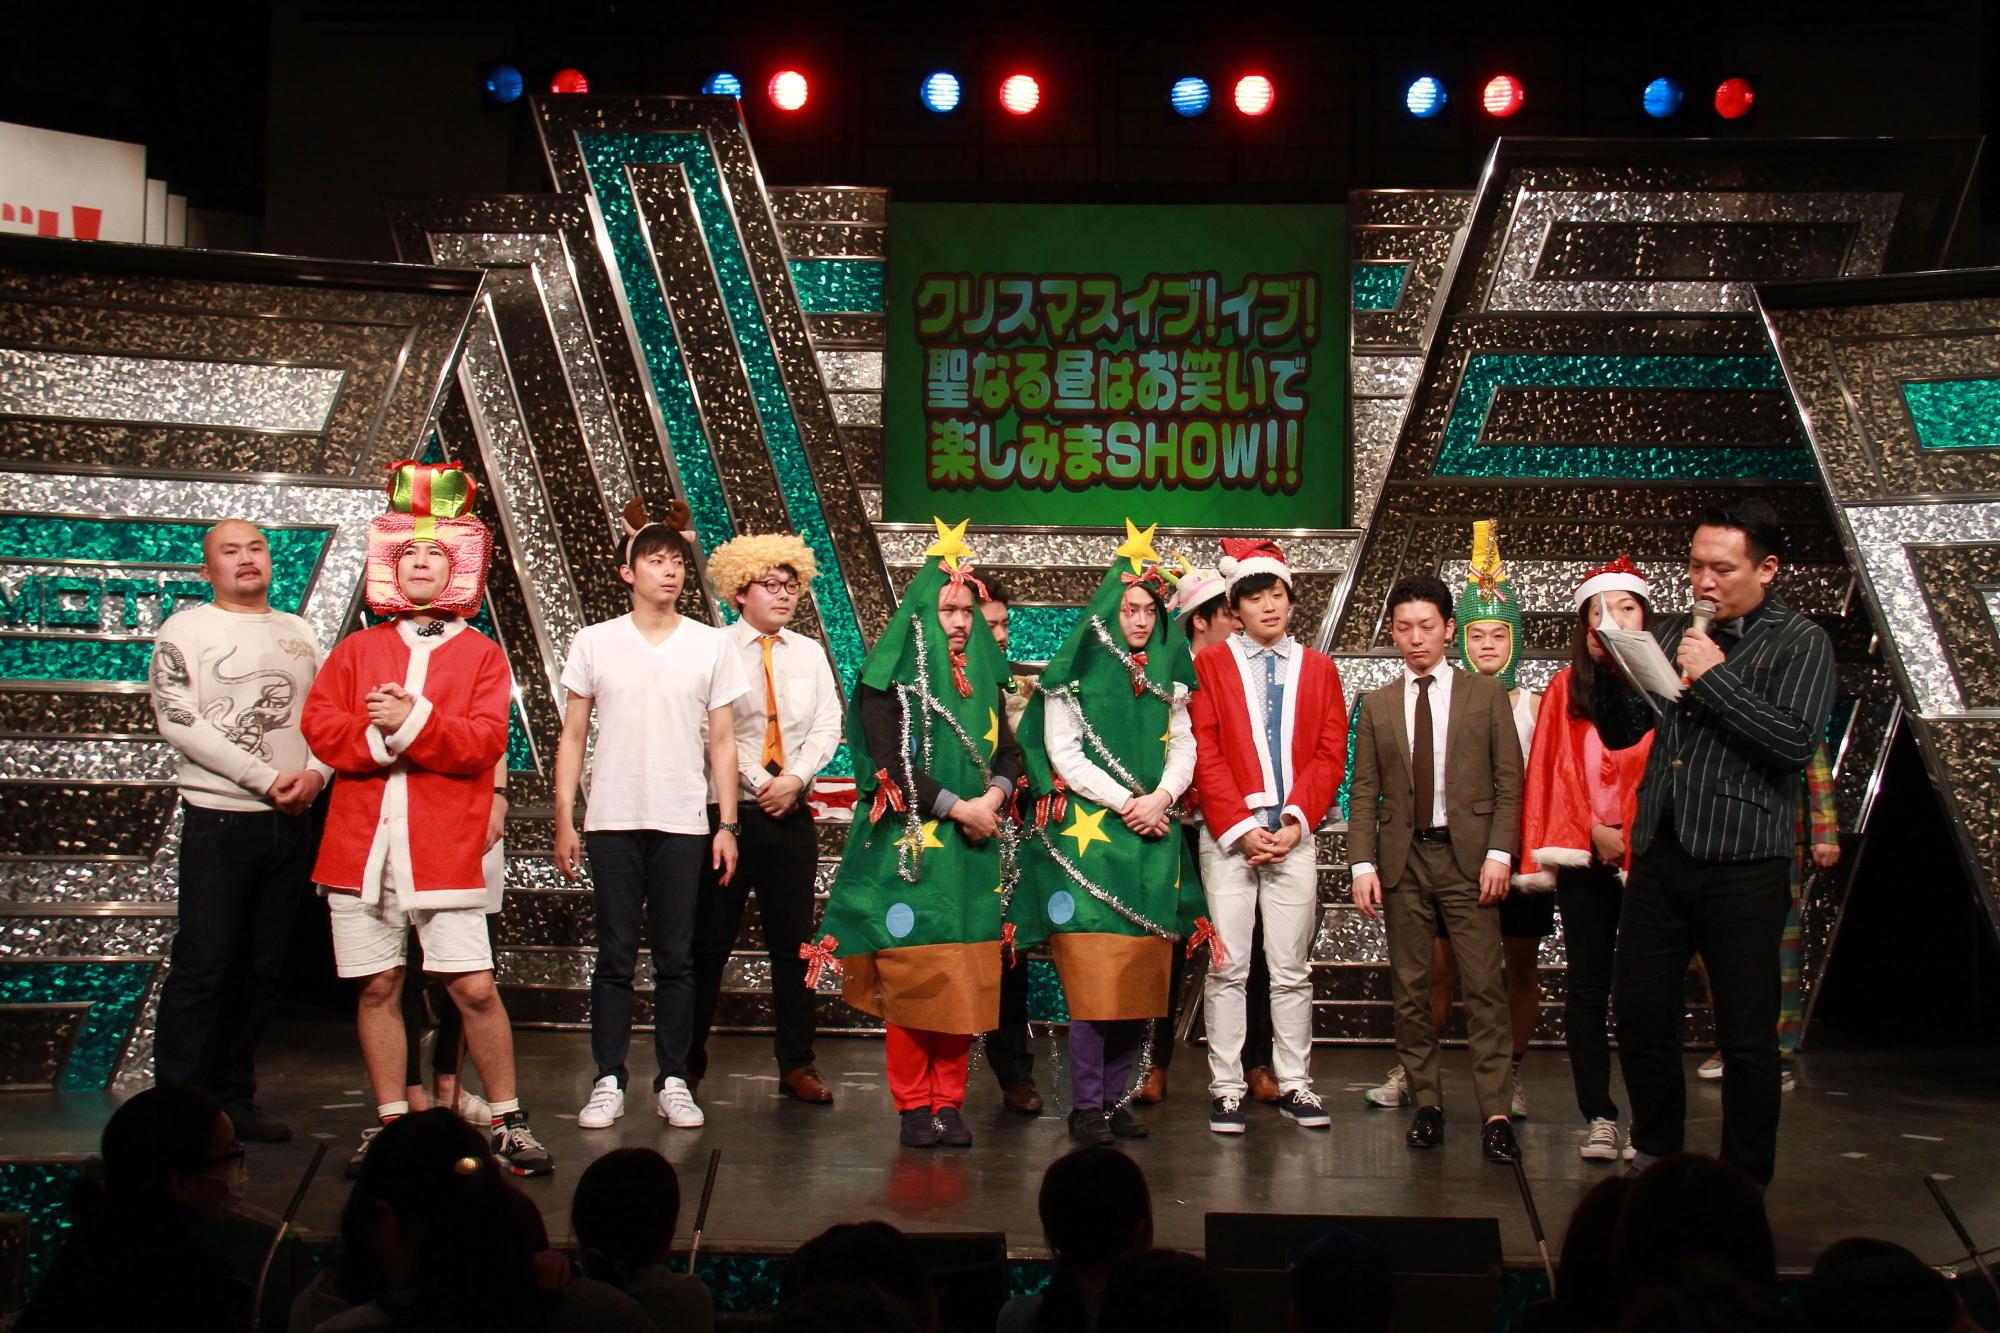 http://news.yoshimoto.co.jp/20151230123323-09abbaa7952d49d09078a65c83bc1f4e2dd548c0.jpg